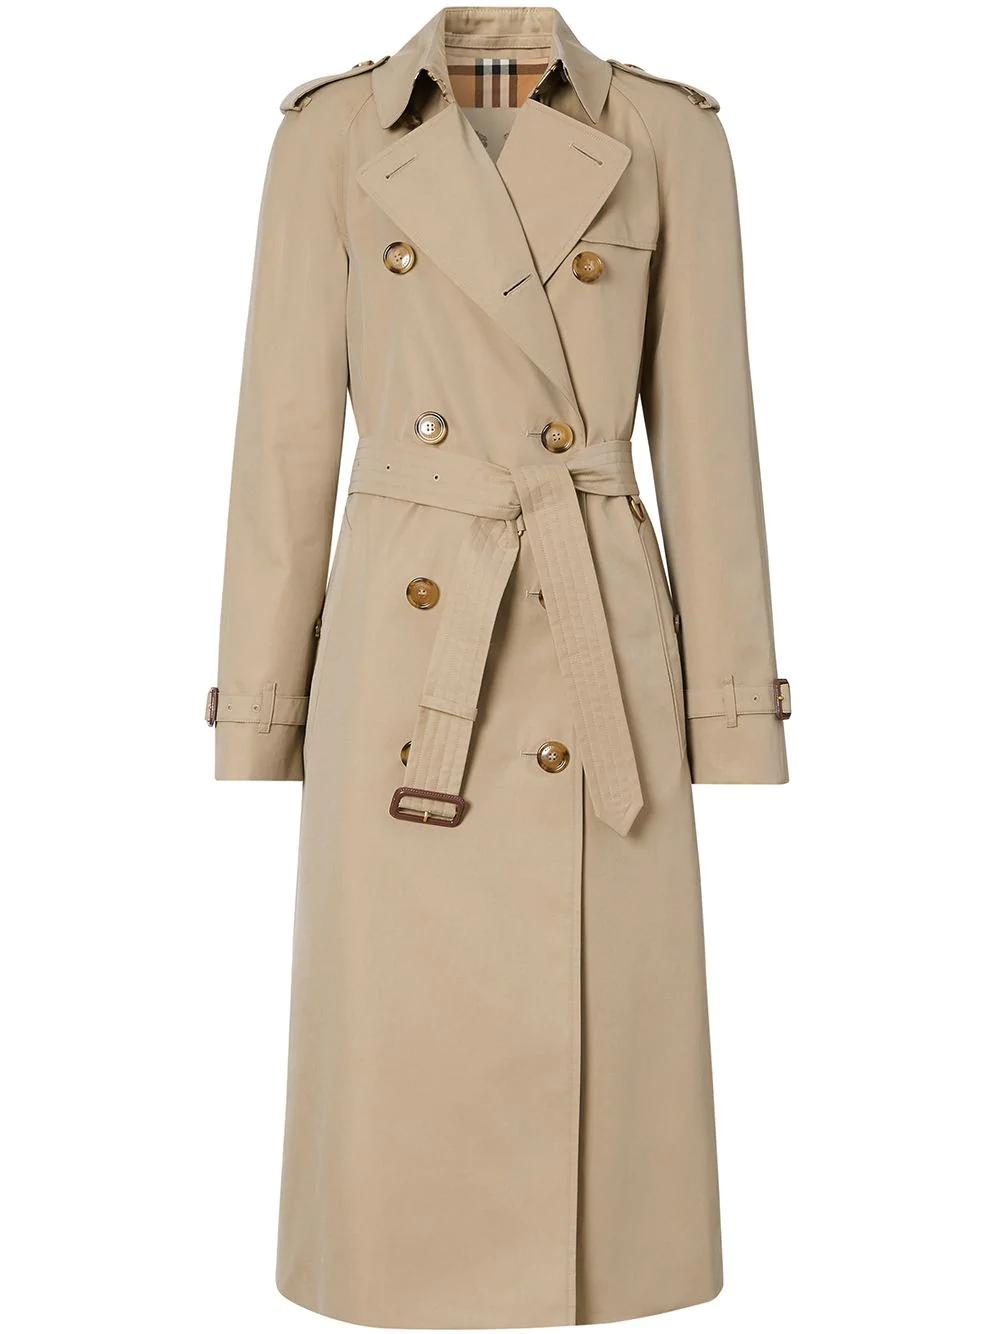 Burberry Cotton Gabardine Trench Coat Farfetch In 2021 Trench Coat Burberry Trench Coat Coat